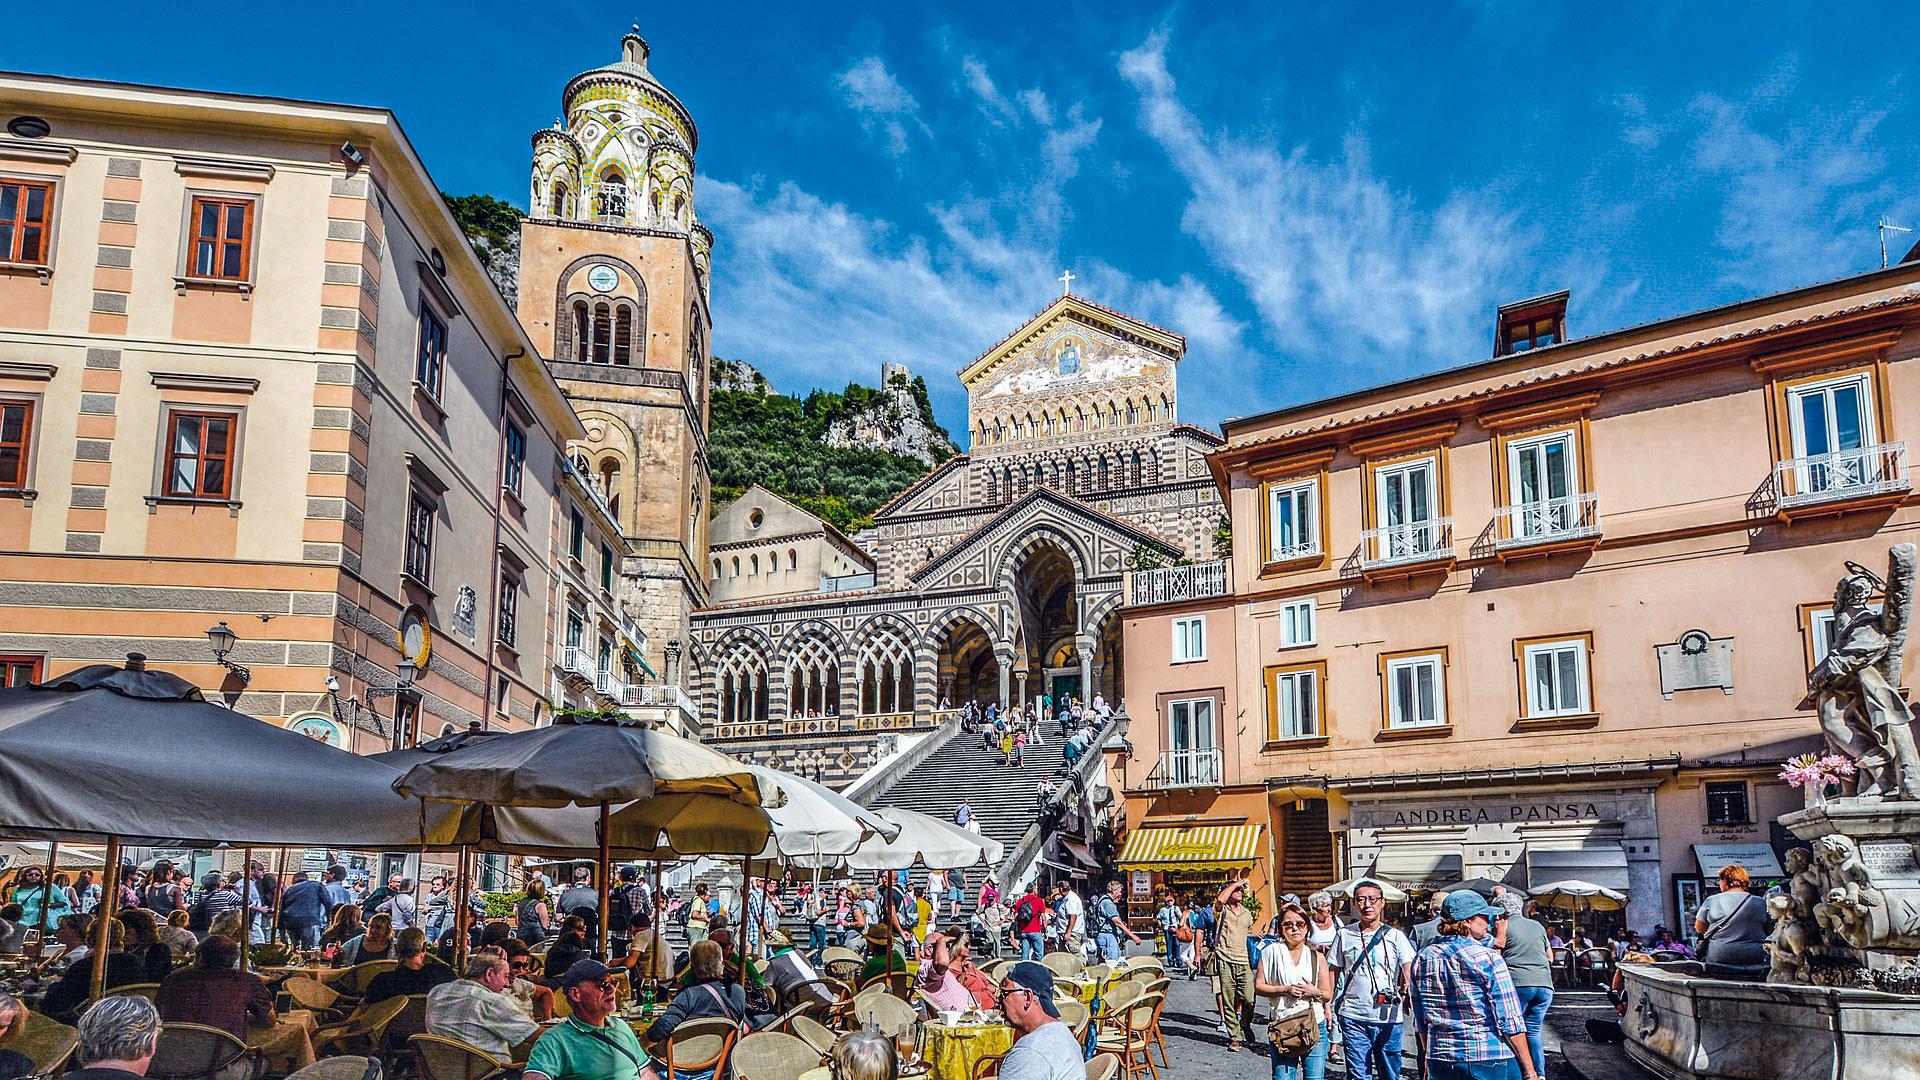 esperienza Piazza Amalfi - Duomo e fontana Sant Andrea Apostolo